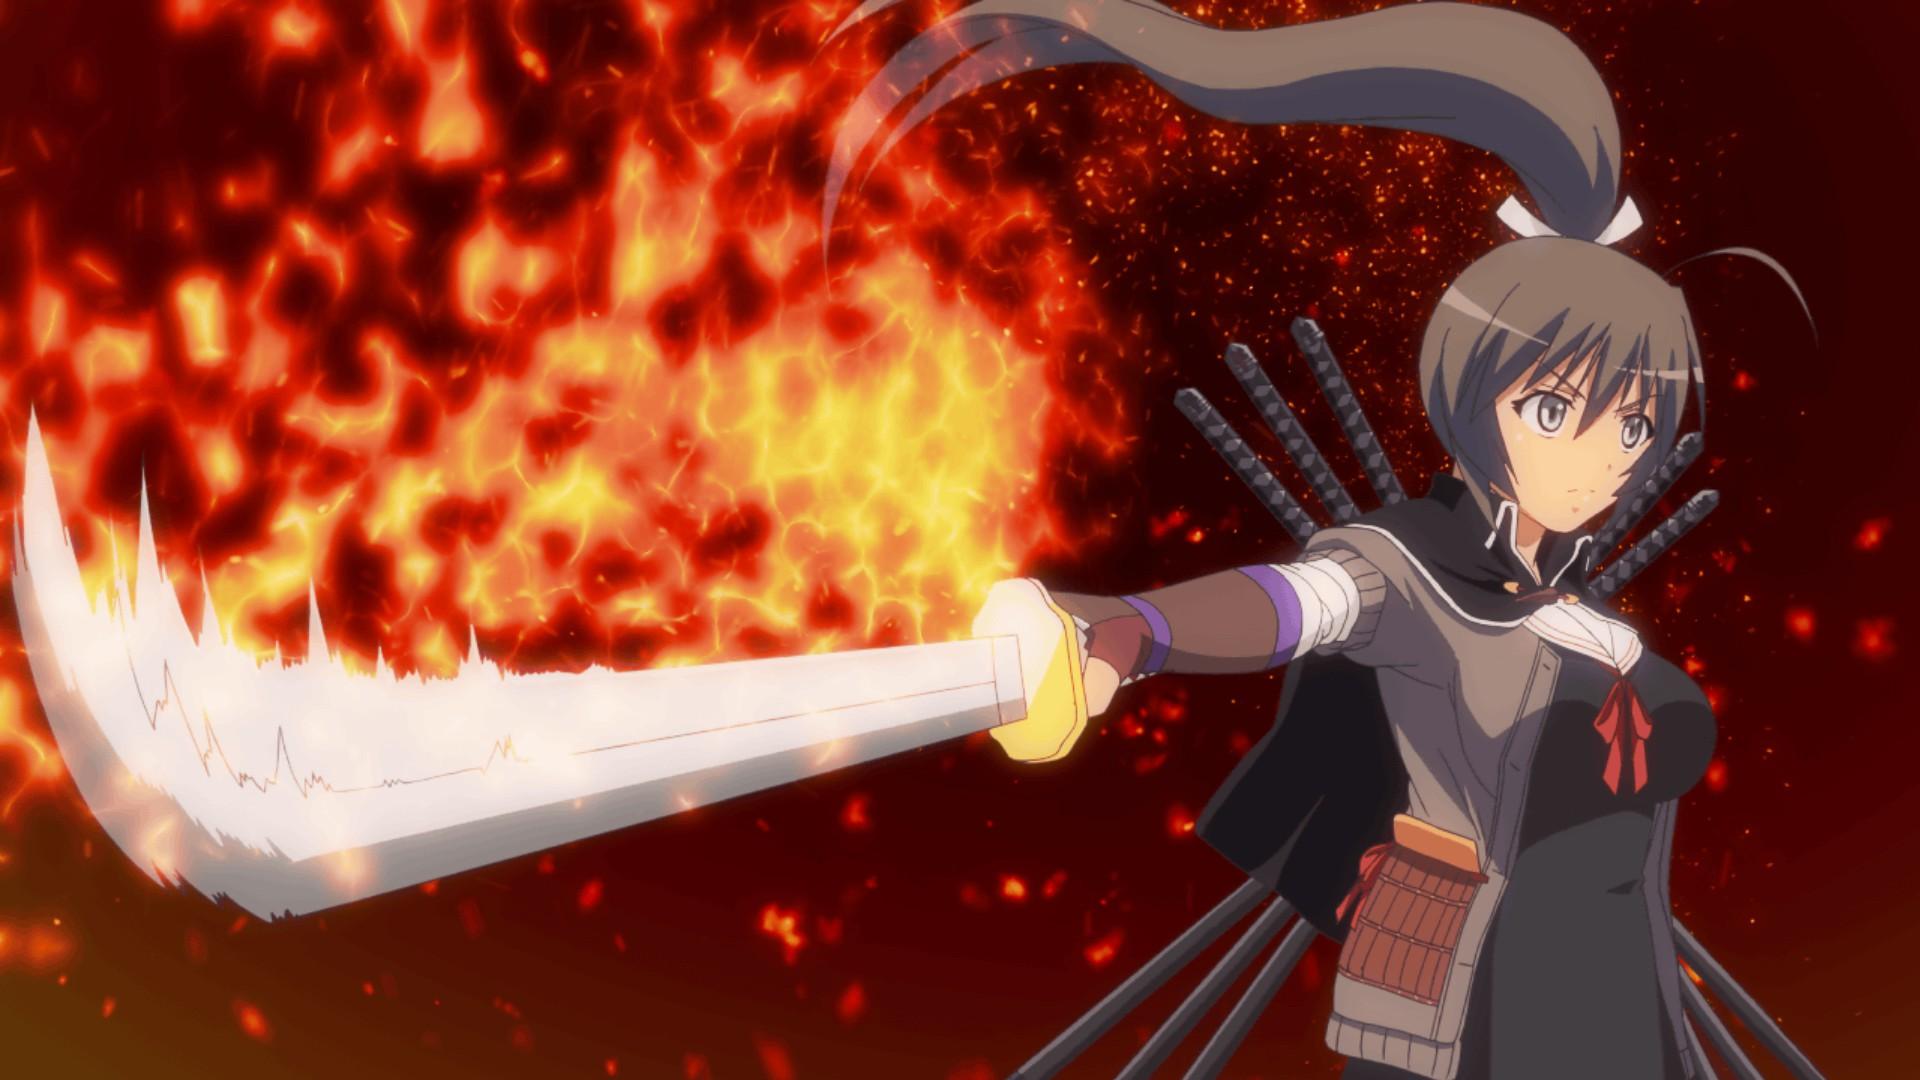 nitroplus-blasterz-heroines-infinite-duel-screenshot-3